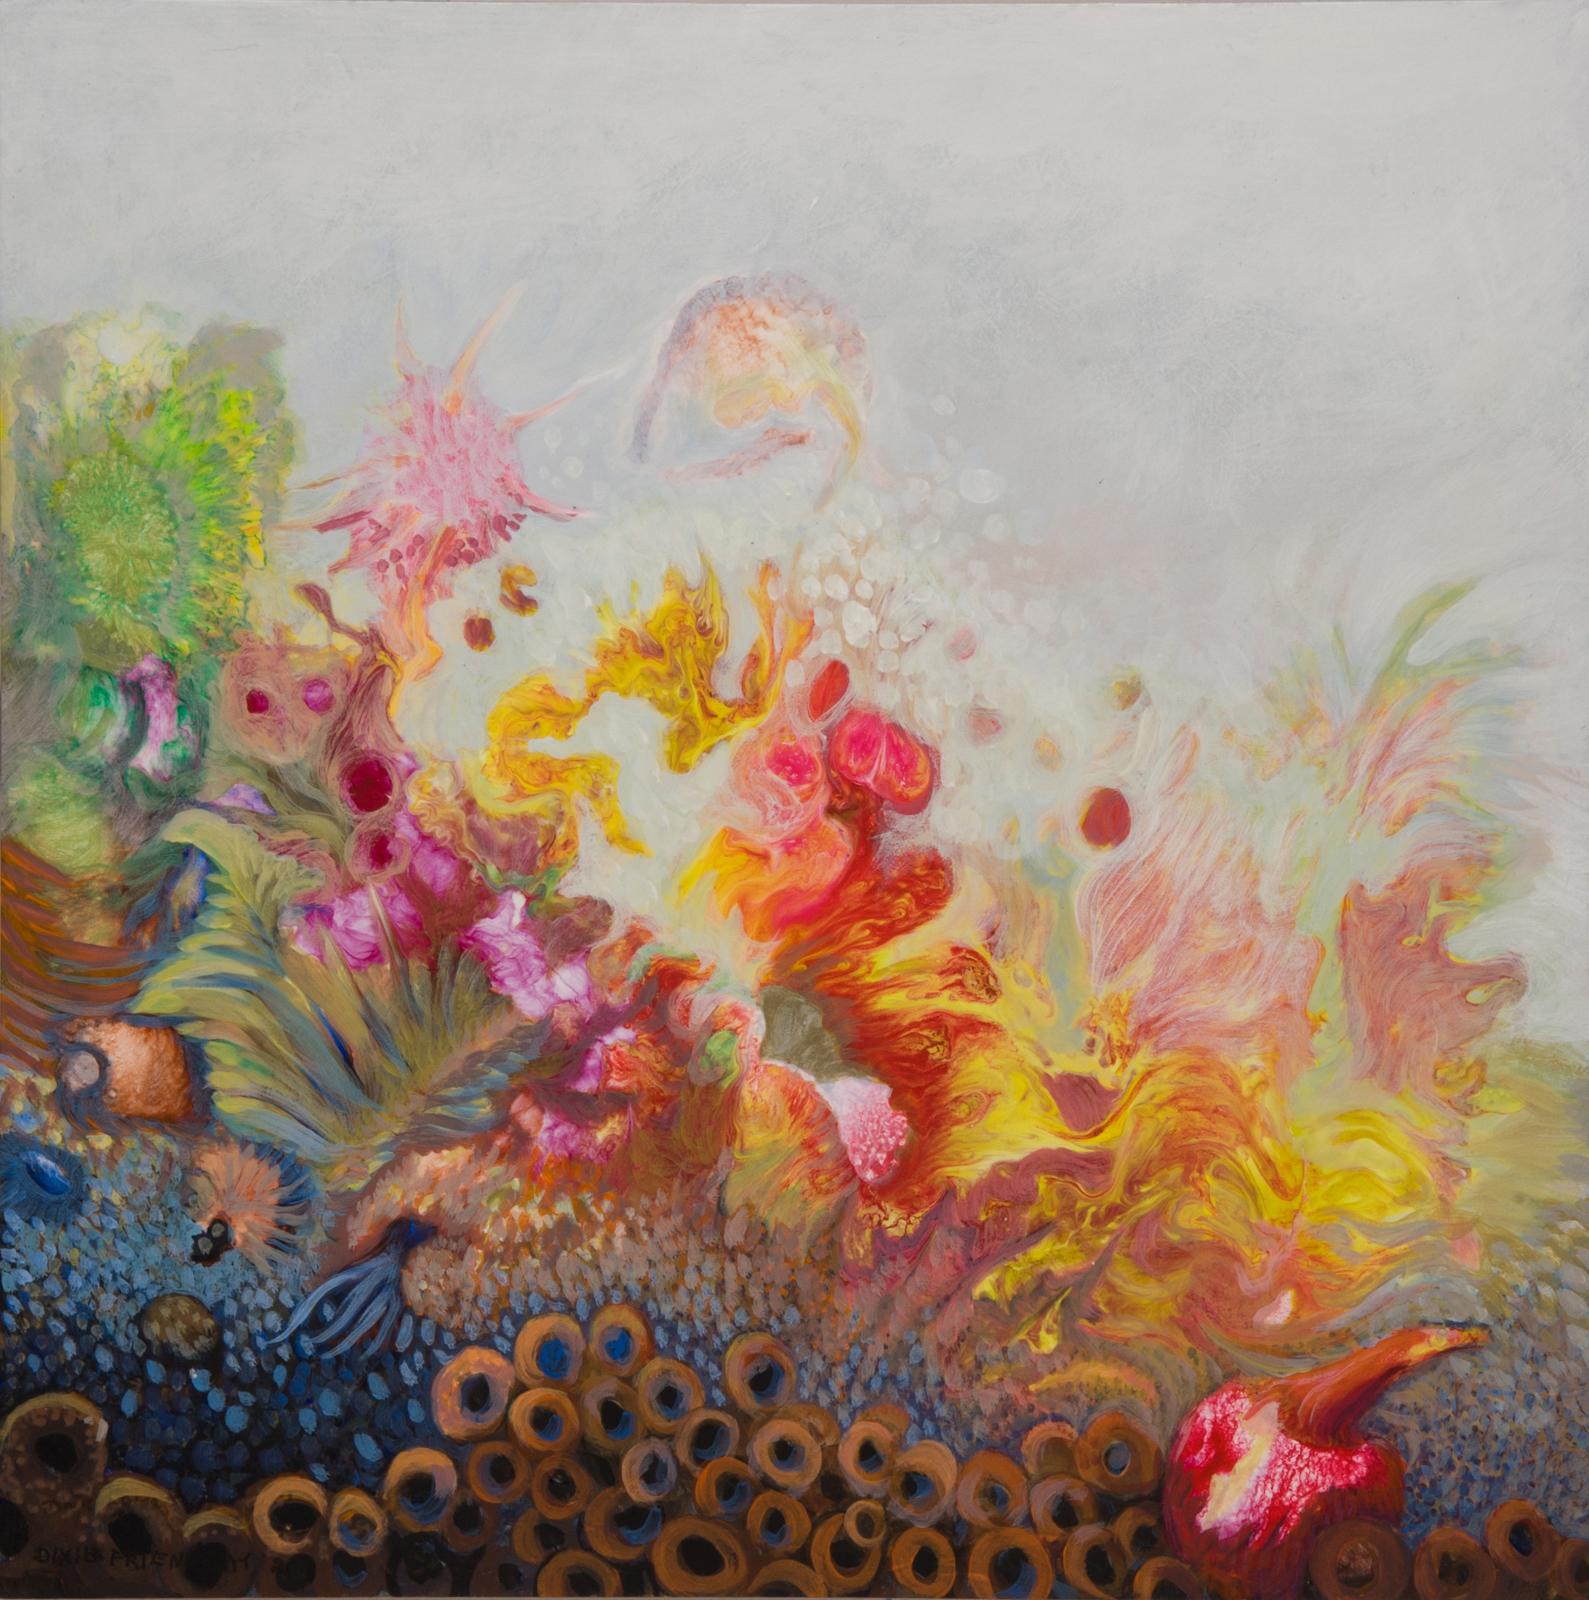 Cells III, 2011